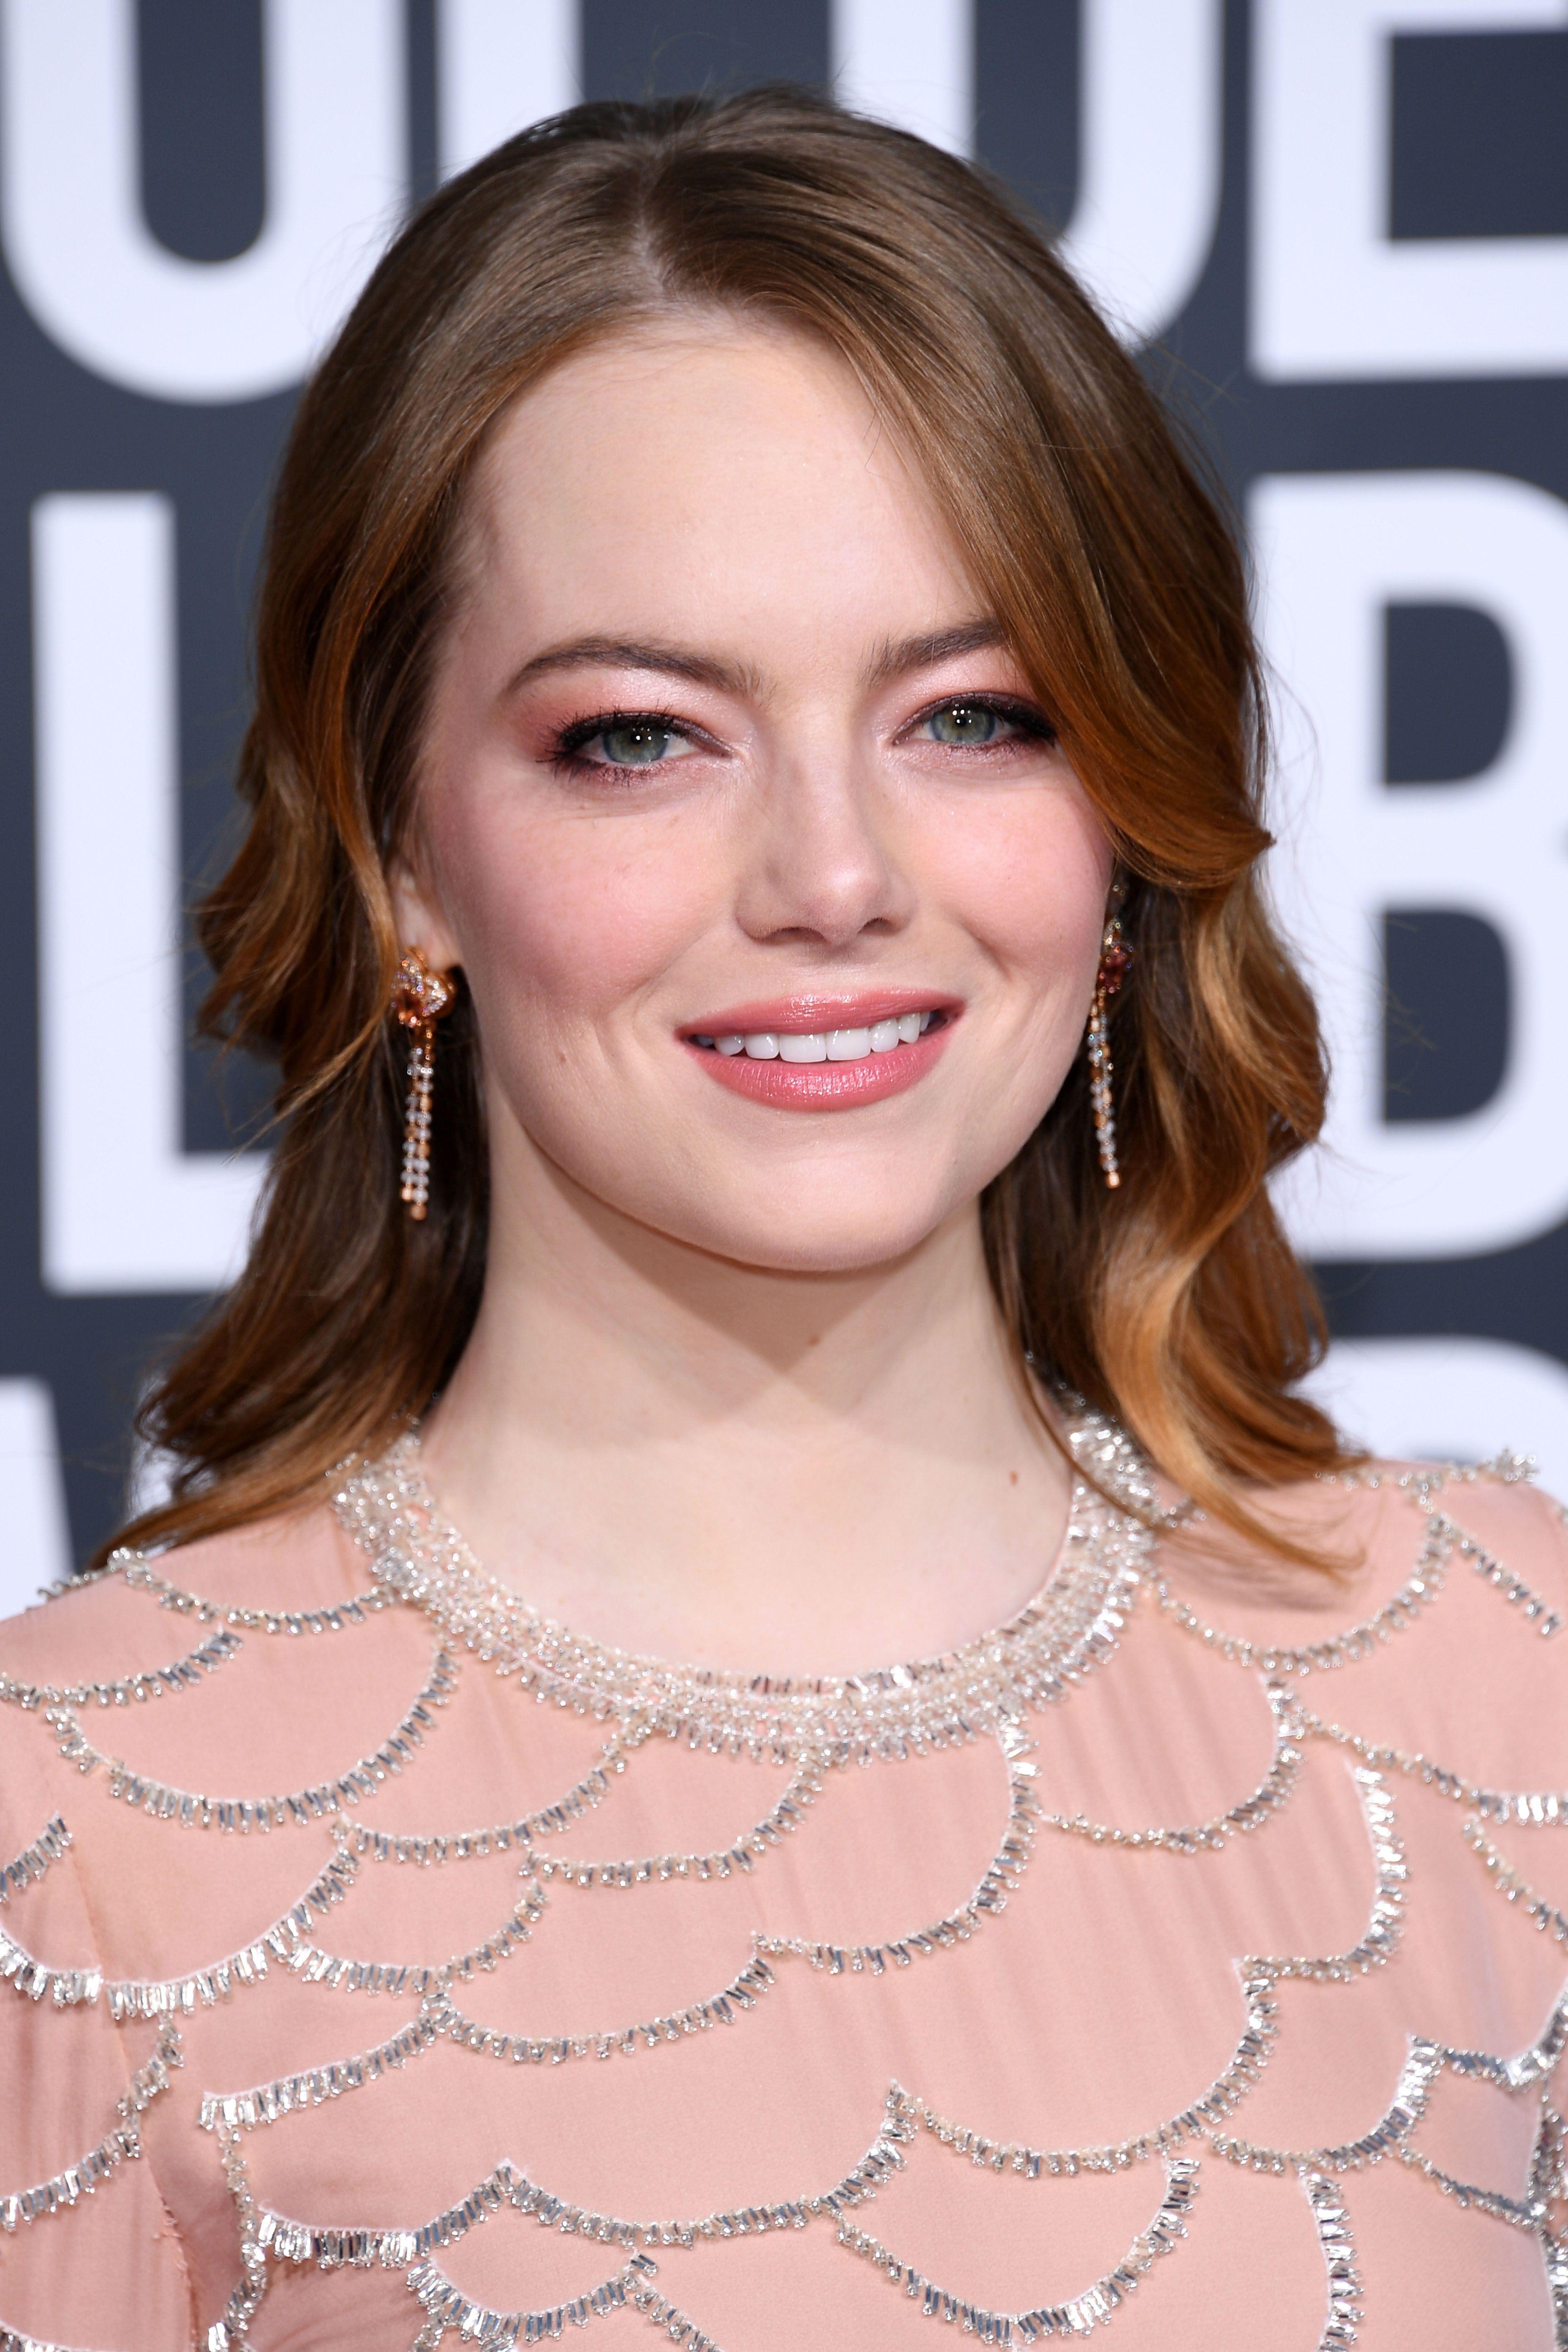 Emma Stone Makeup - 76th Annual Golden Globe Awards - Arrivals